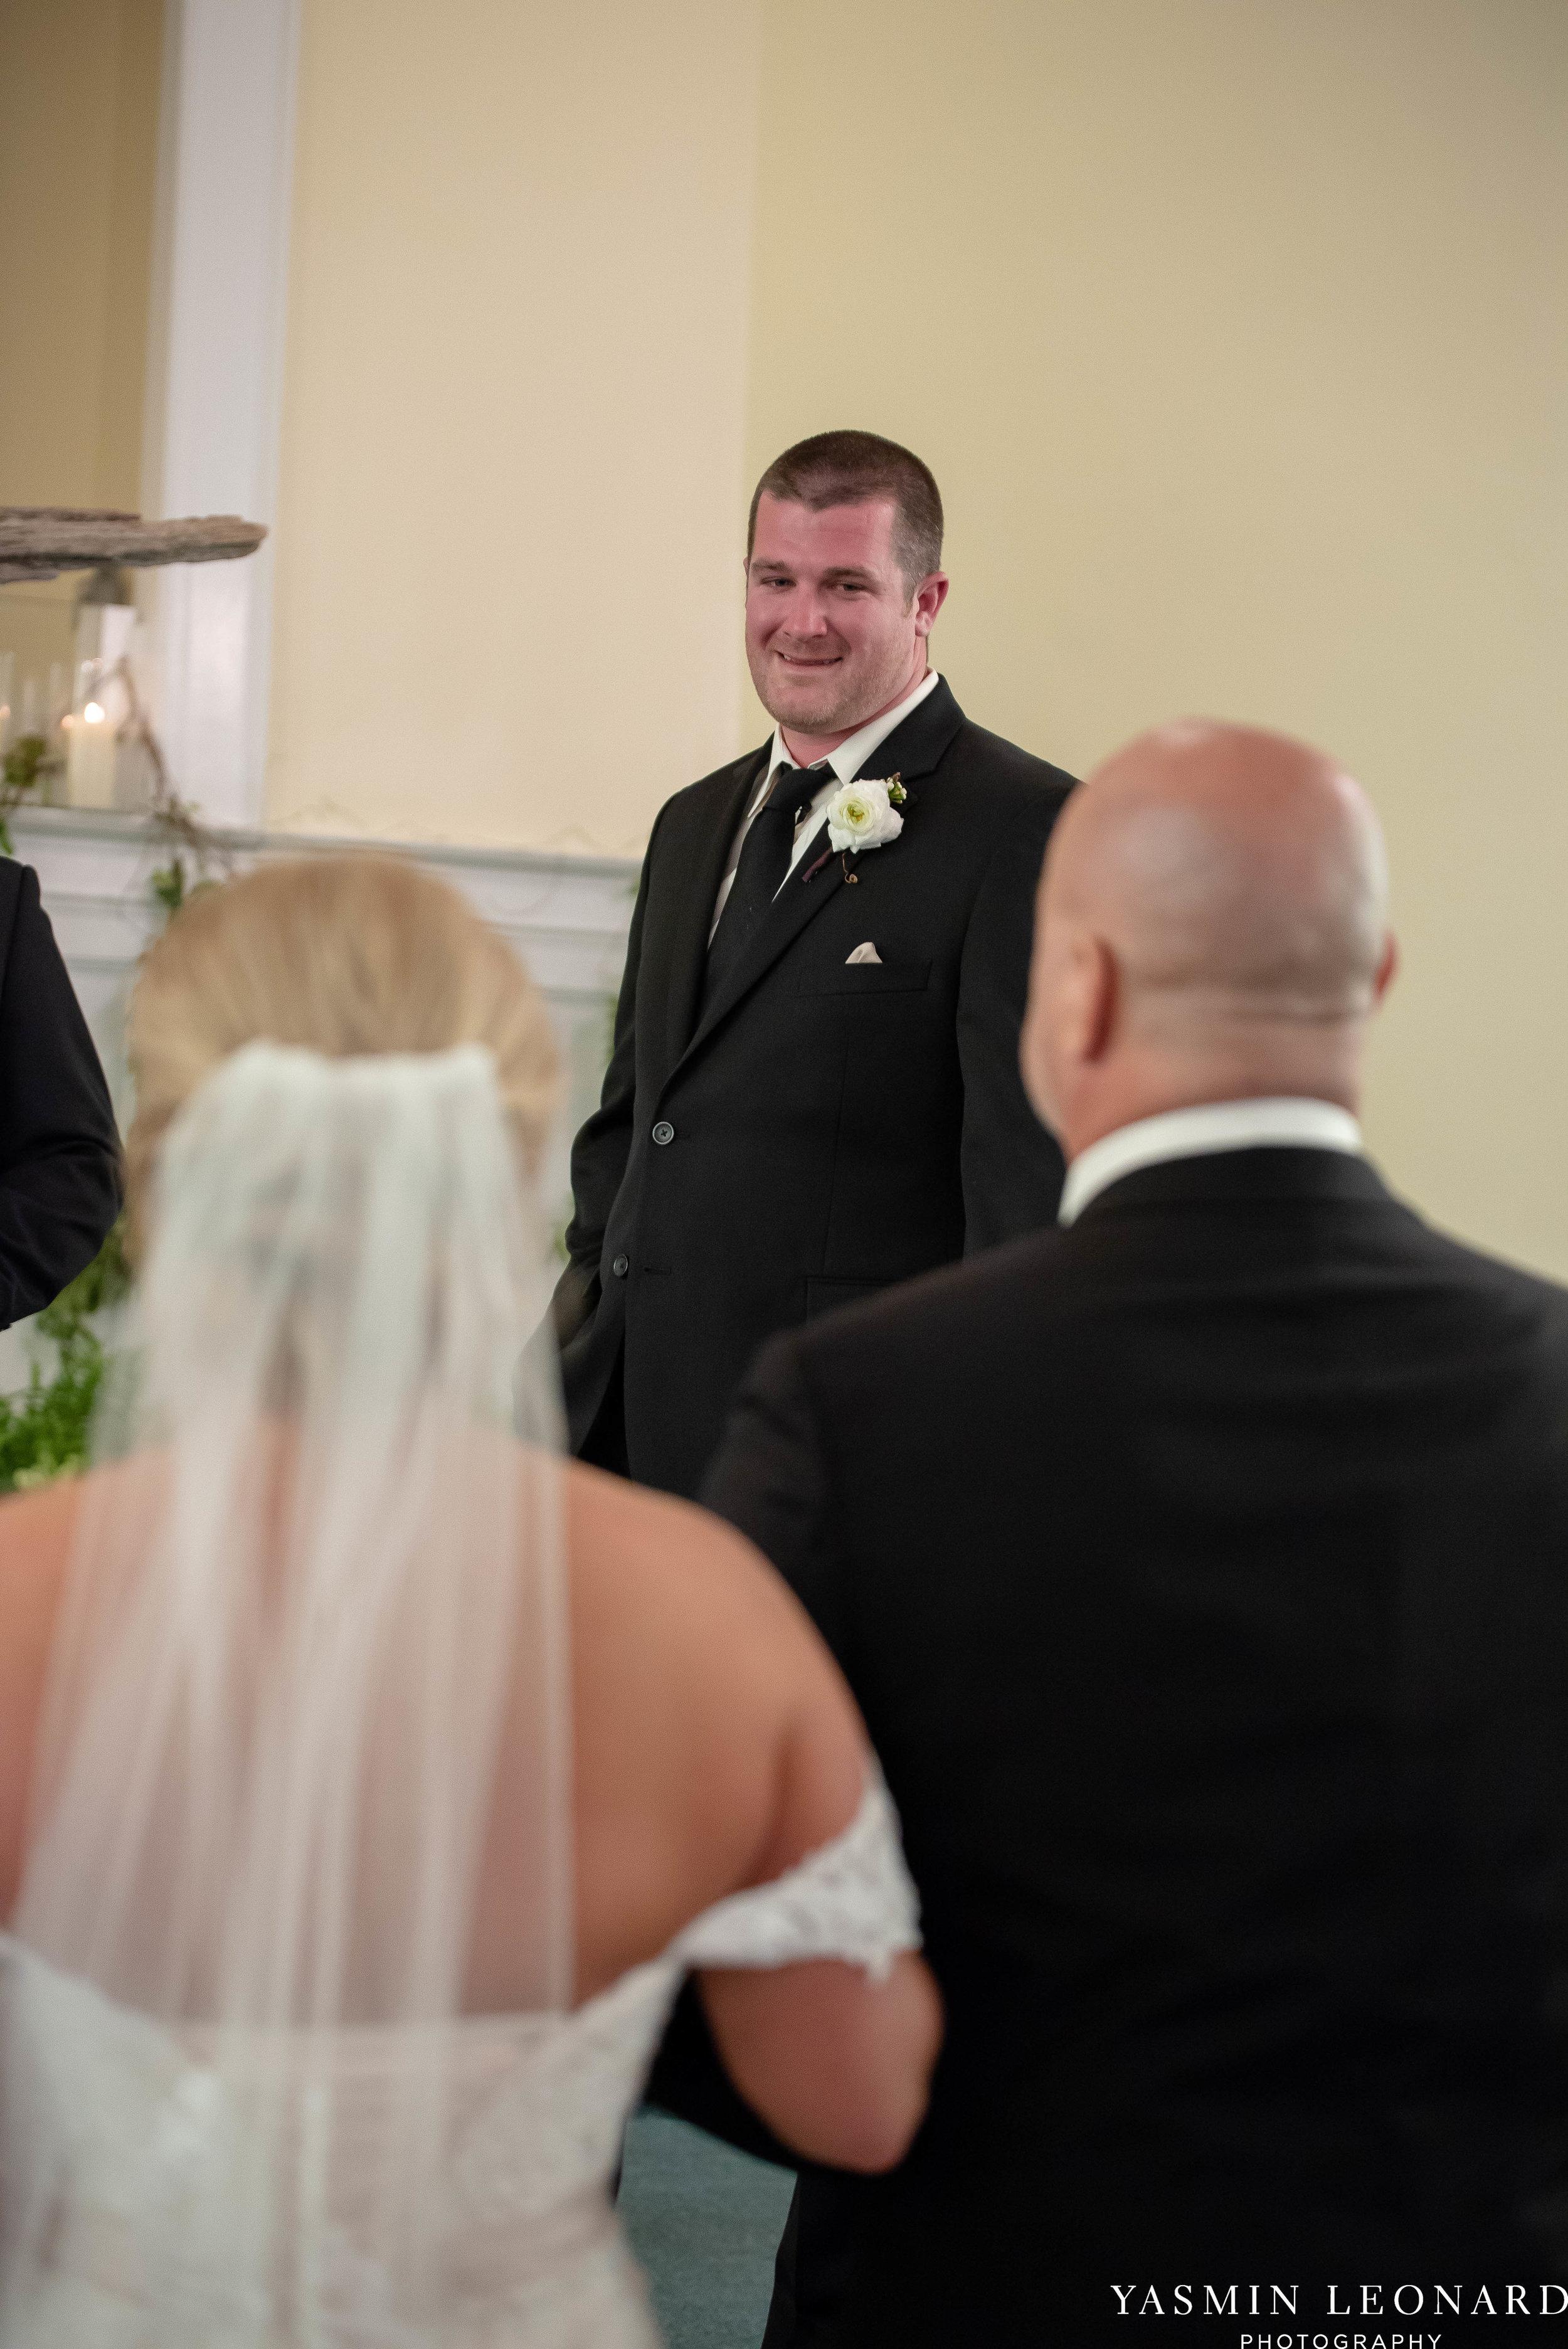 Carolina Beach Wedding - Fort Fisher Wedding - NC Acquarium - Beach Wedding - NC Wedding - Beach Wedding Inspiration - Beach Bride-16.jpg